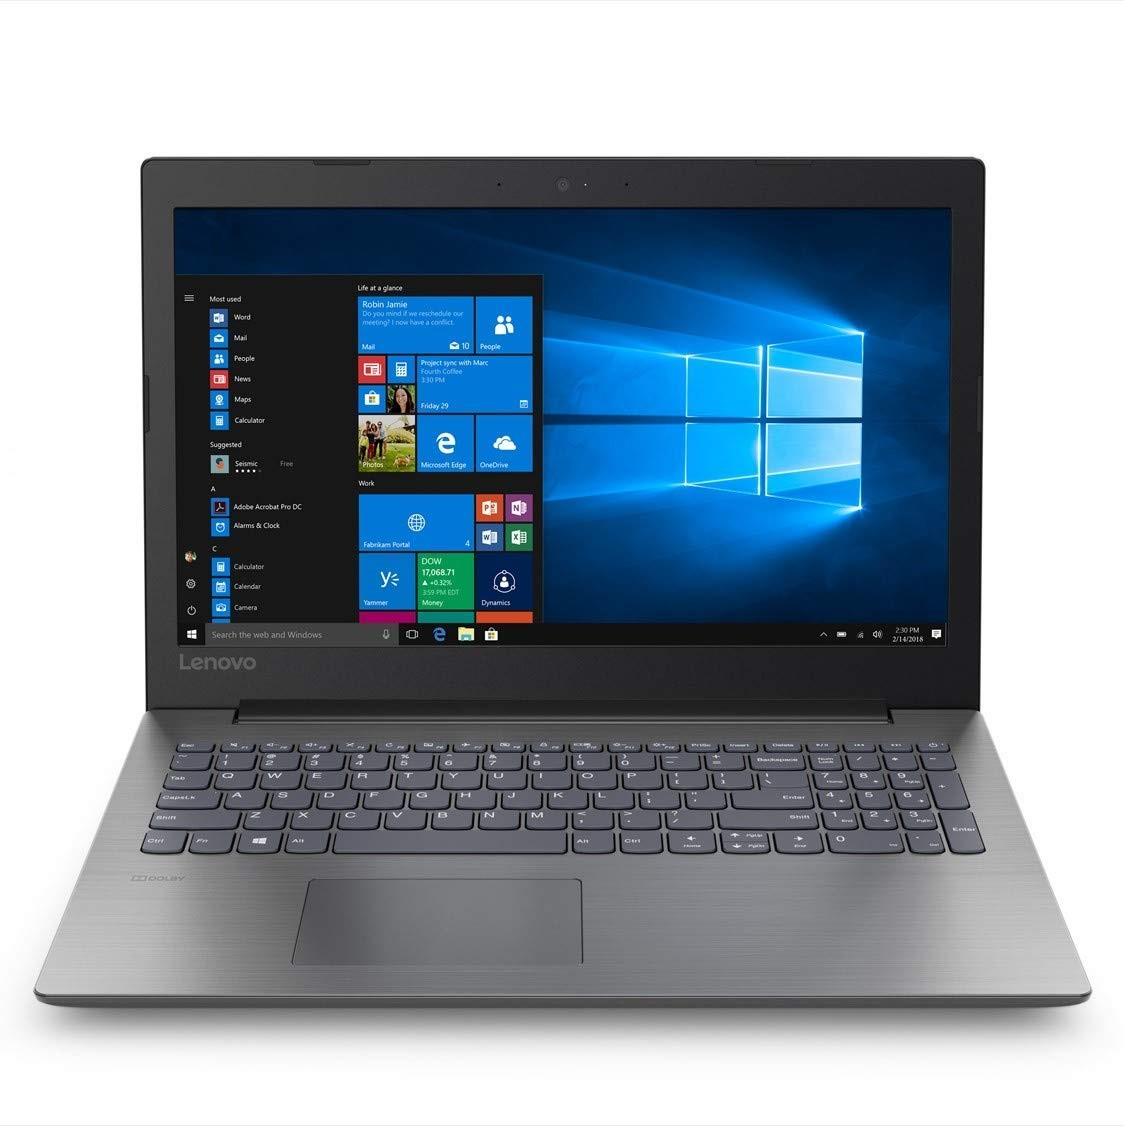 Lenovo Ideapad 330 - Core i5 8th Gen/ 8 GB/ 128GB SSD/ 1 TB HDD/ 4 GB  Nvidia Graphics Laptop